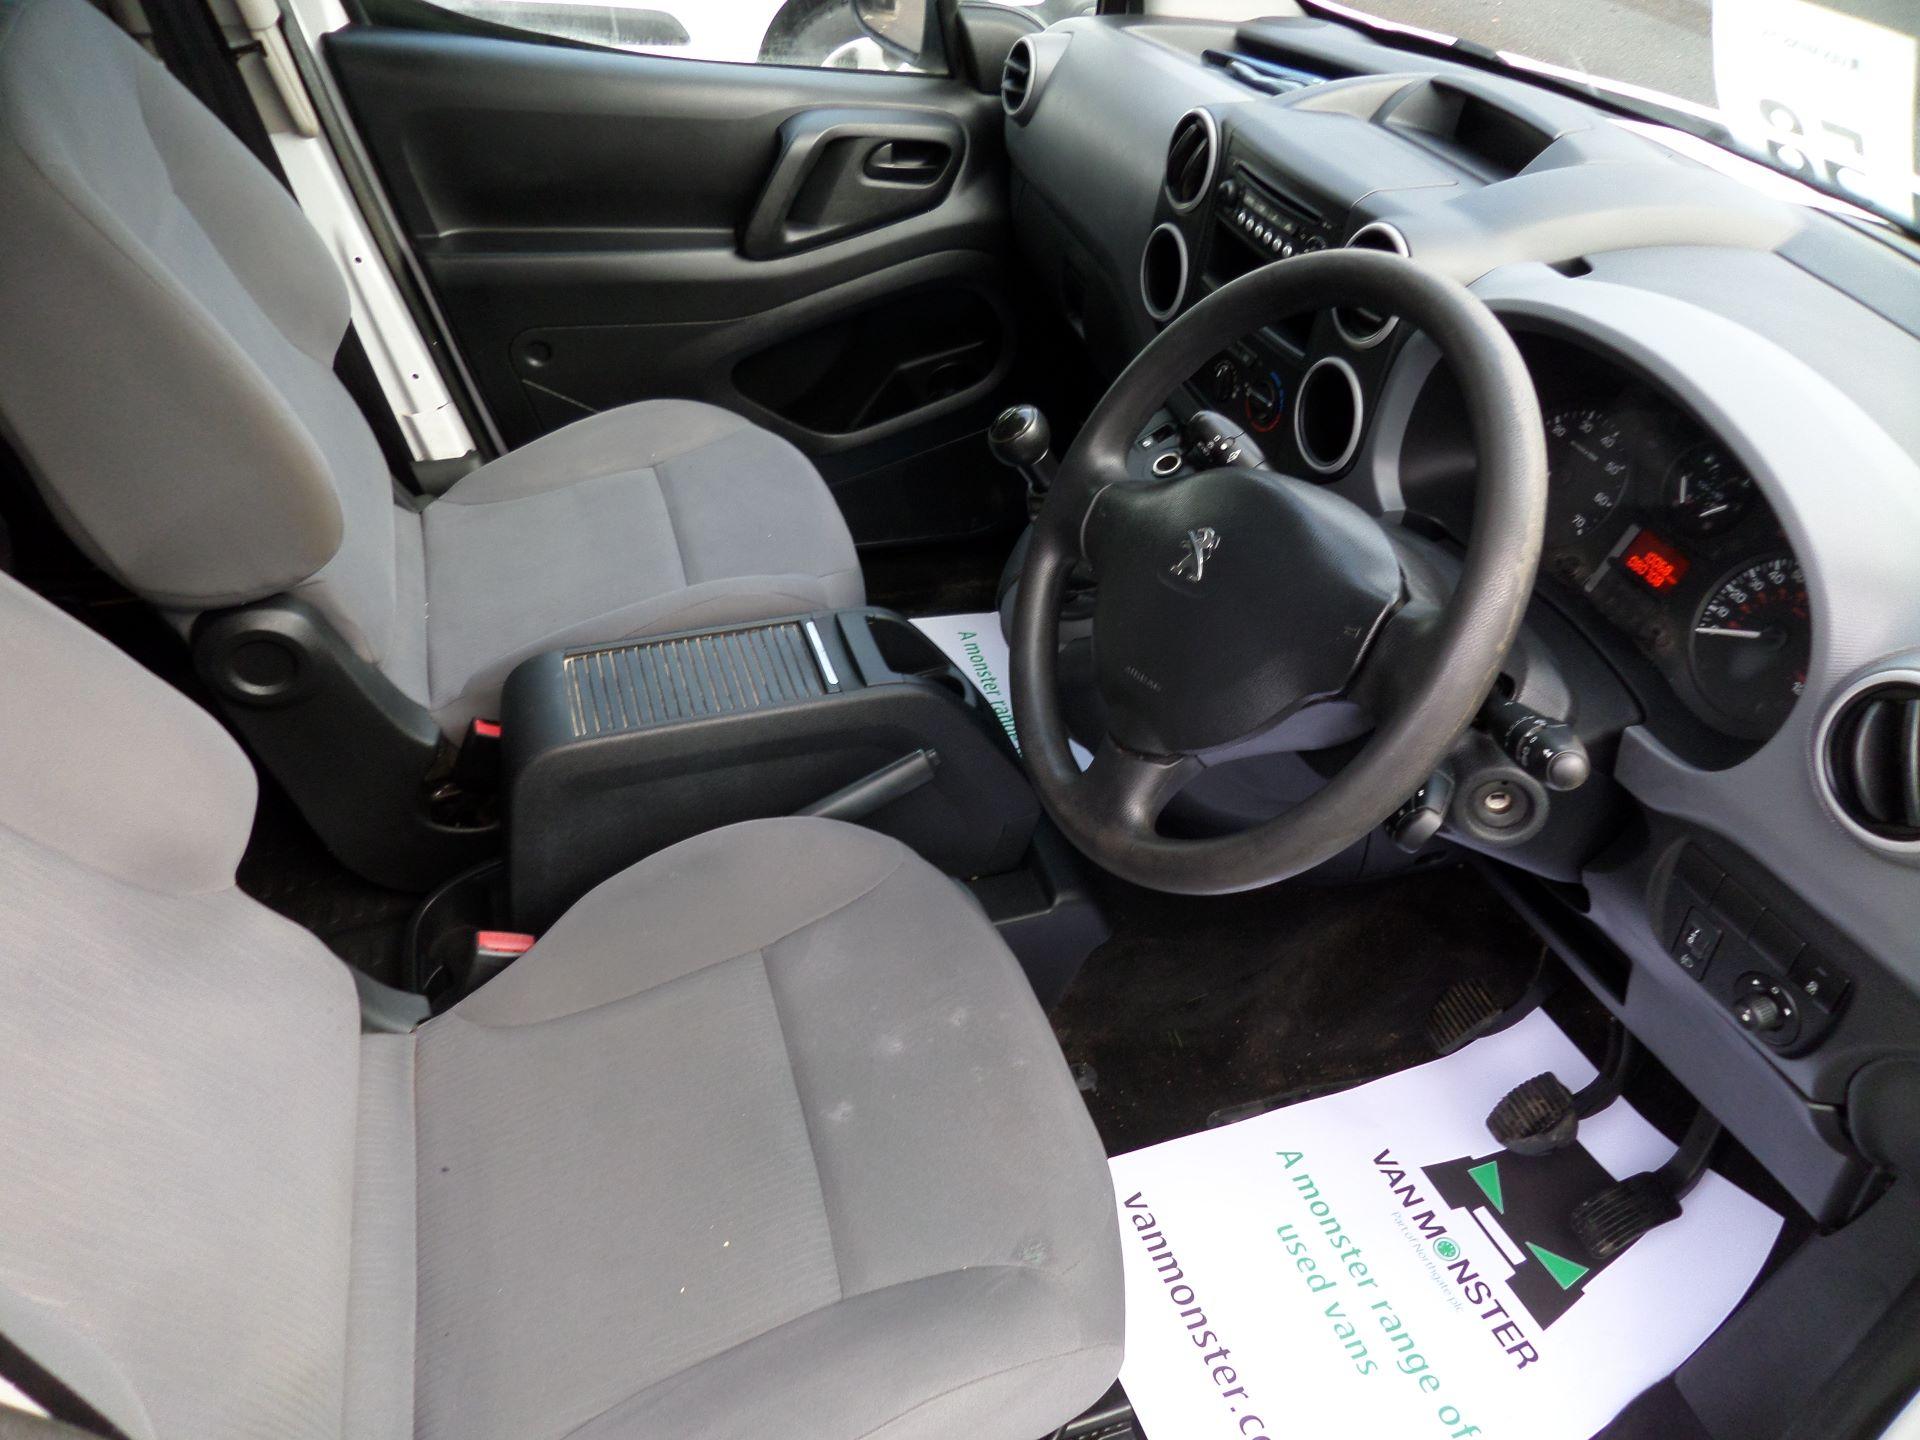 2015 Peugeot Partner 716 S 1.6 Hdi 92 Crew Van Euro 5 (NU65MMX) Image 2